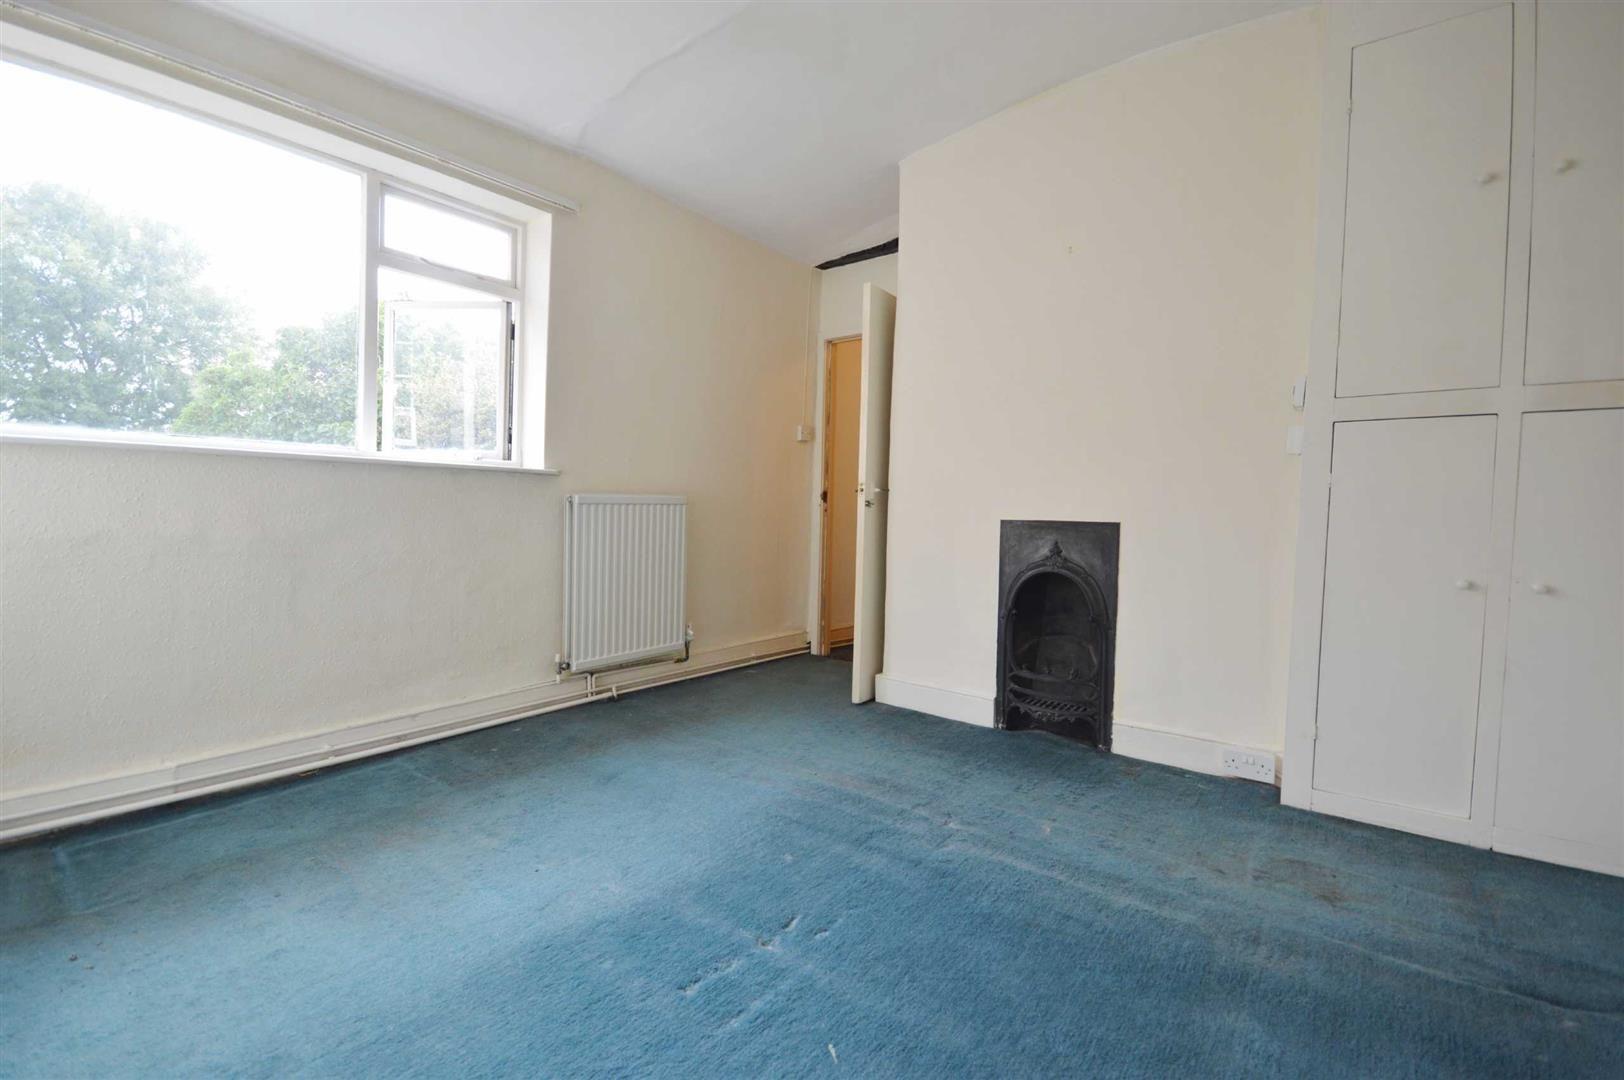 3 bed cottage for sale in Leominster 6